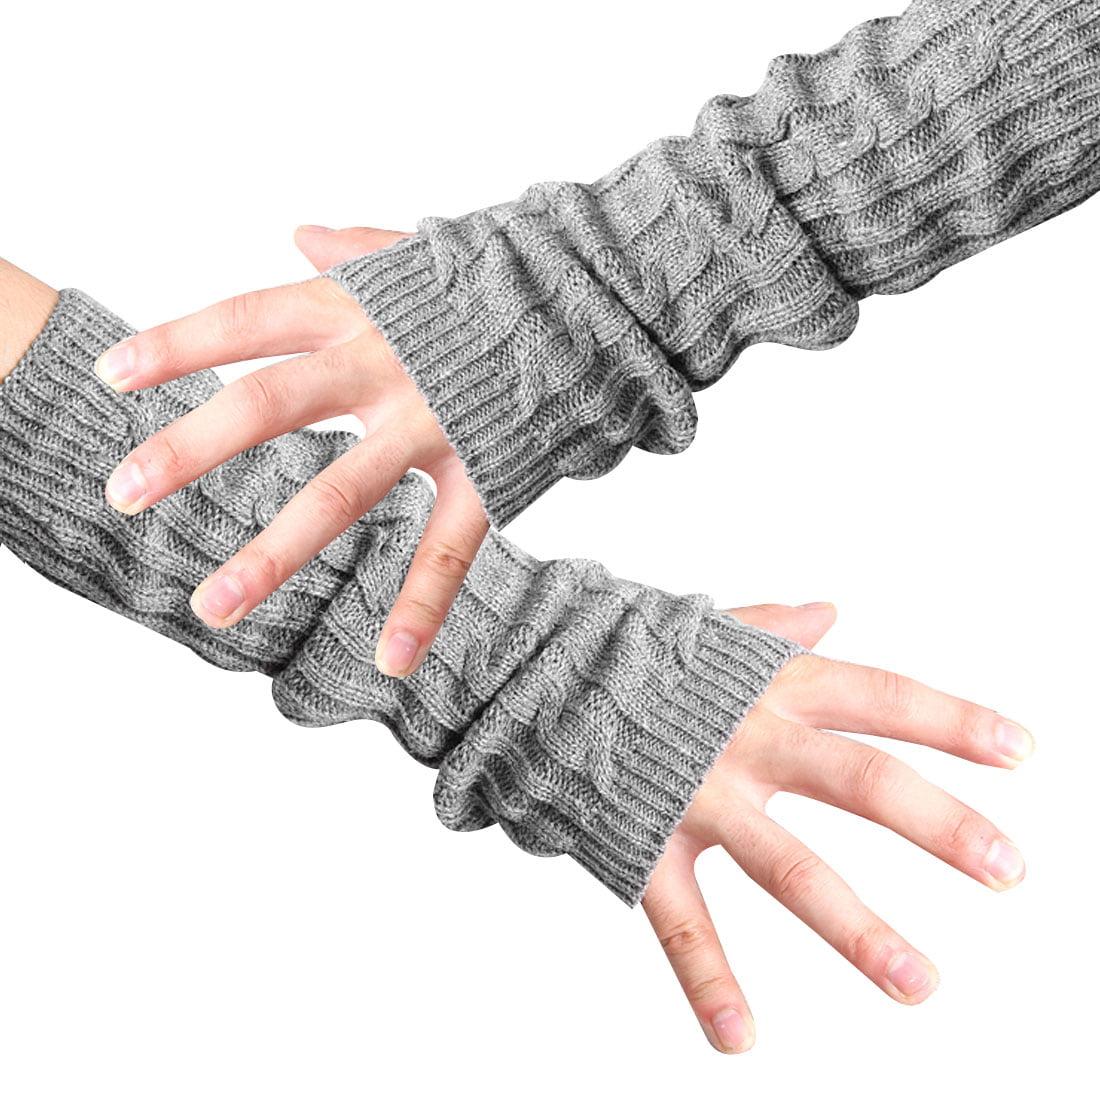 Tasharina Men's Stretchy Fingerless Knit Textured Design Warmers Gloves Gray